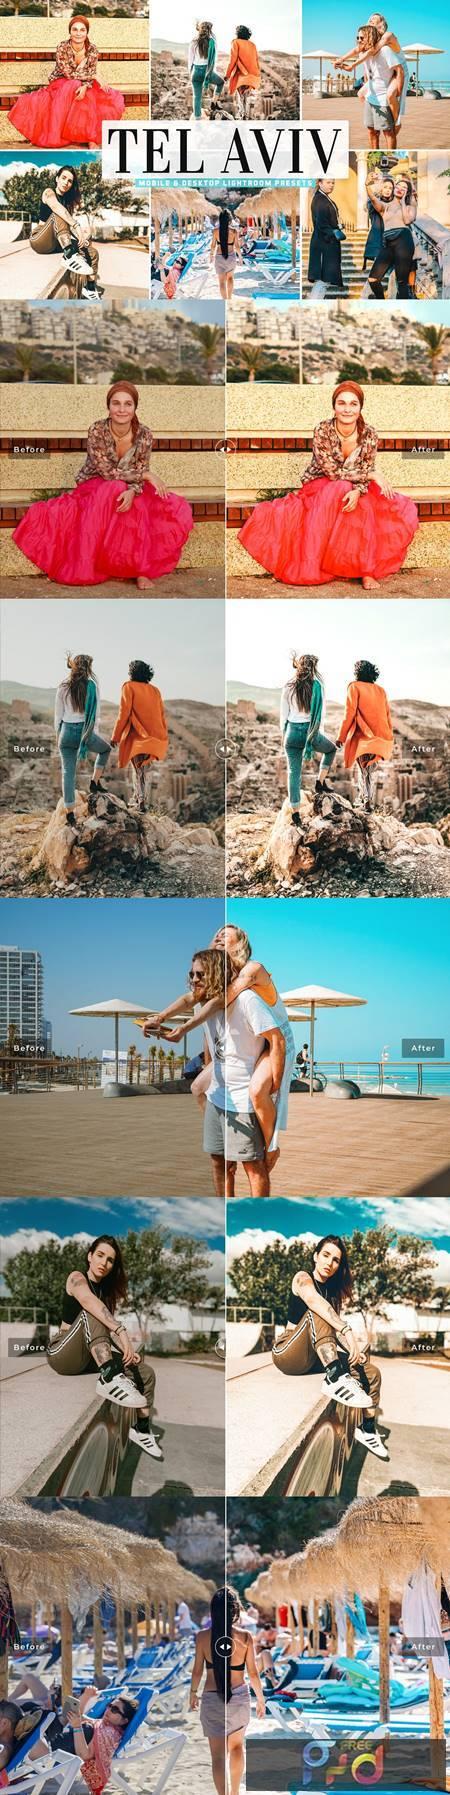 Tel Aviv Mobile & Desktop Lightroom Presets 5478012 1